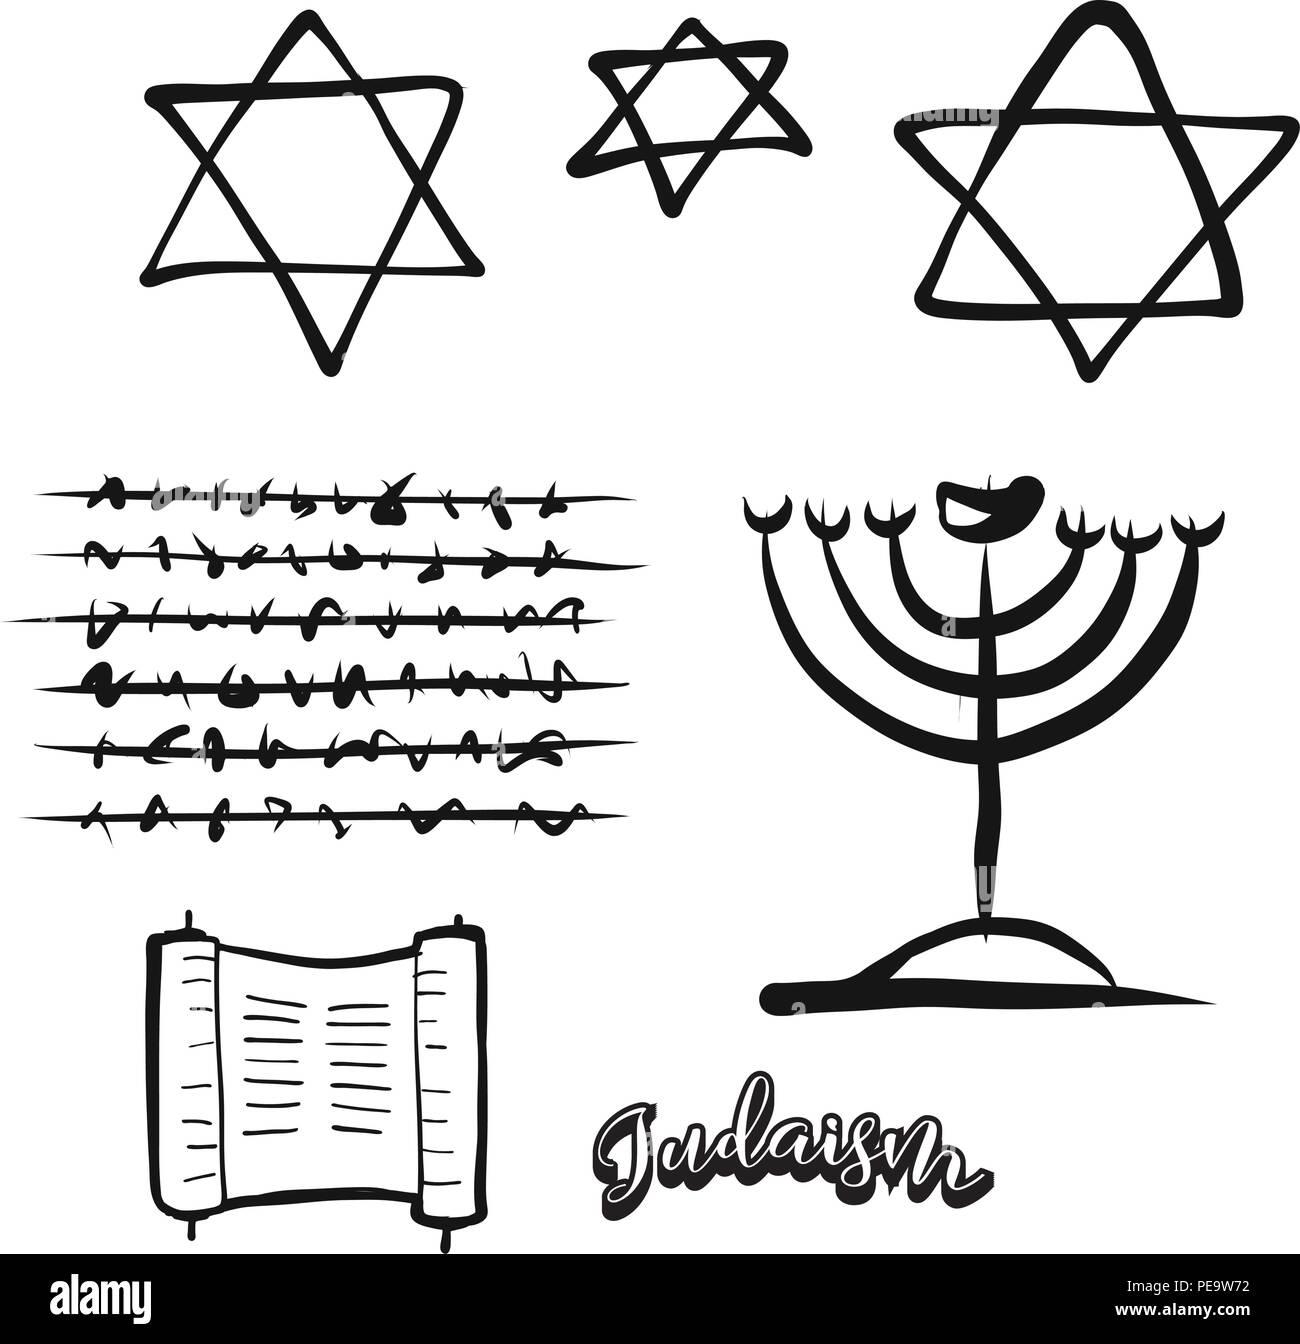 Jüdische Symbole Stockfotos Jüdische Symbole Bilder Alamy